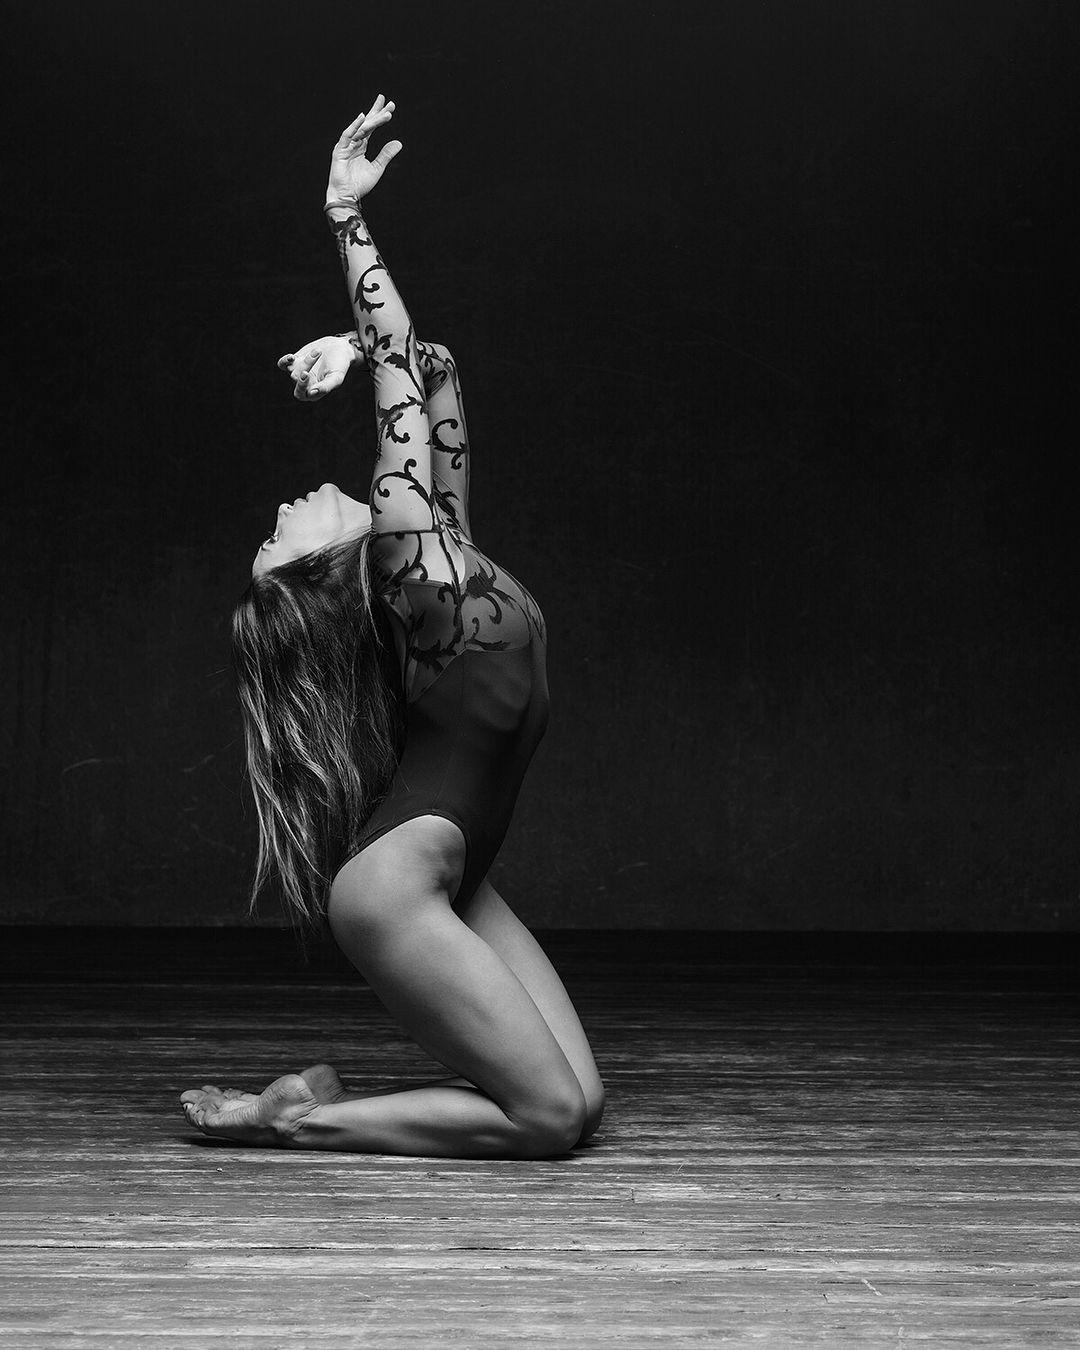 Natalia Averchenkova Rhythmicgymnast Rhytmicgymnastics